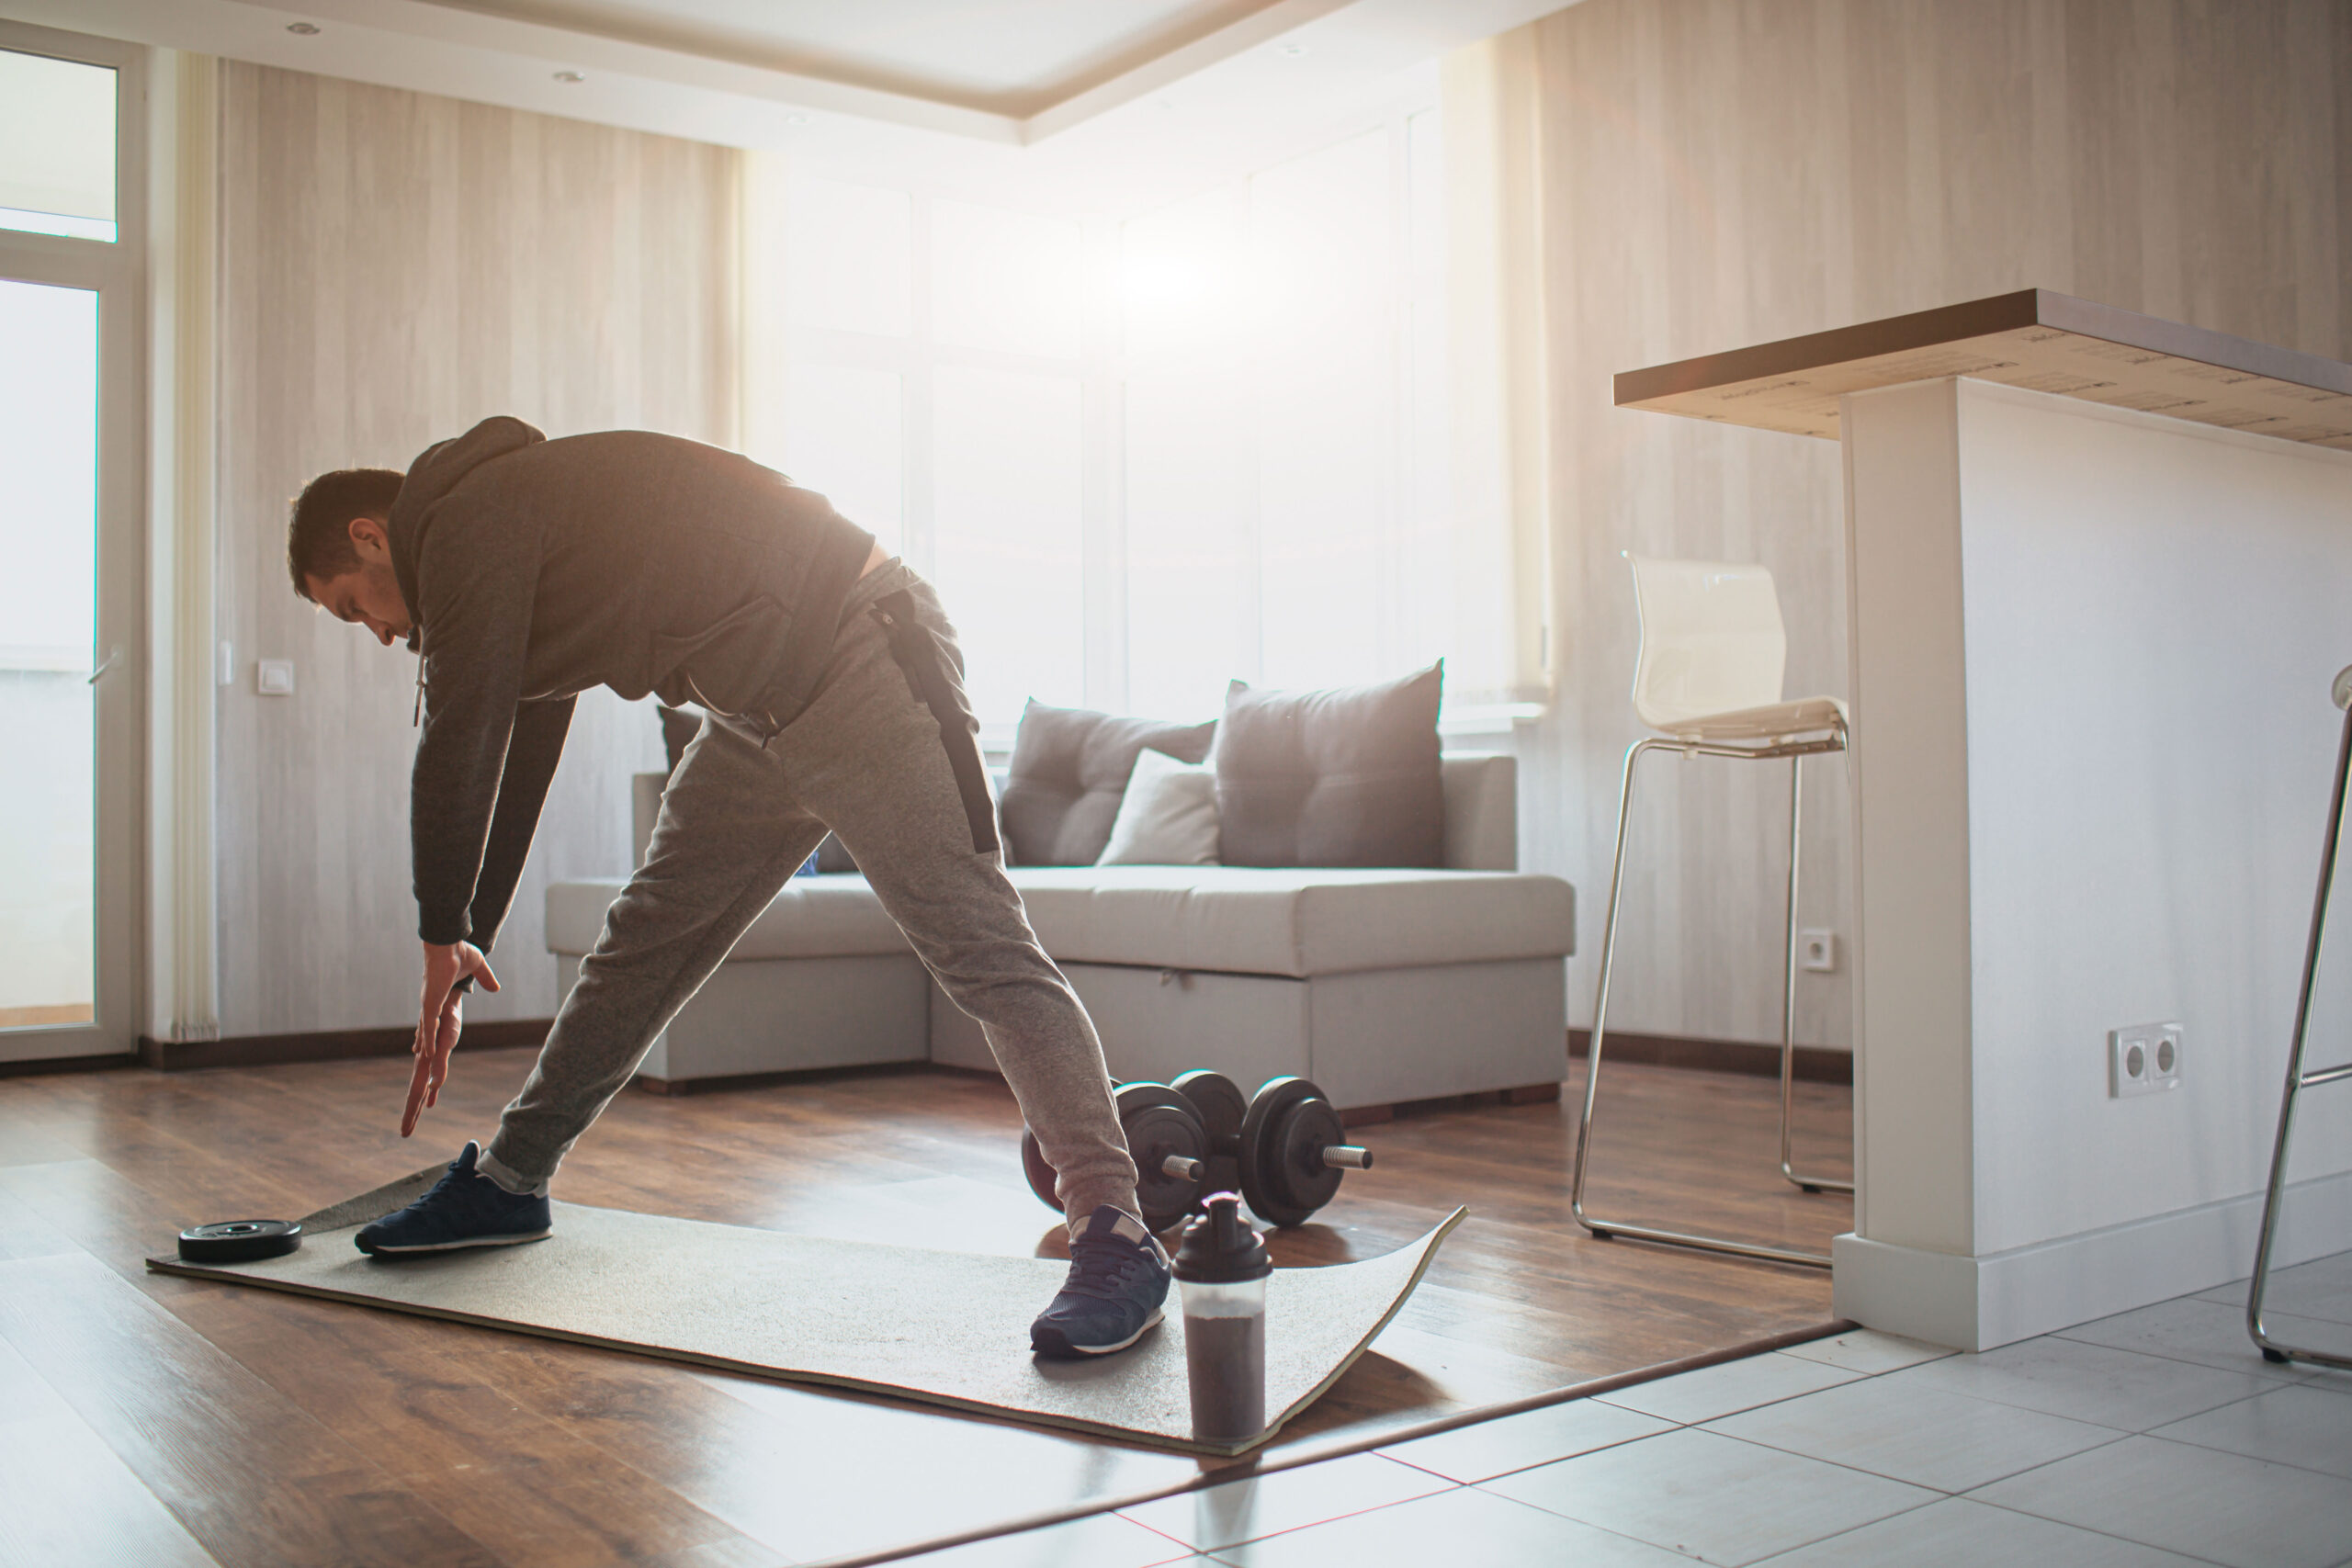 Slutte med snus tips triks anbefalt raad bedre helse helseeffekt